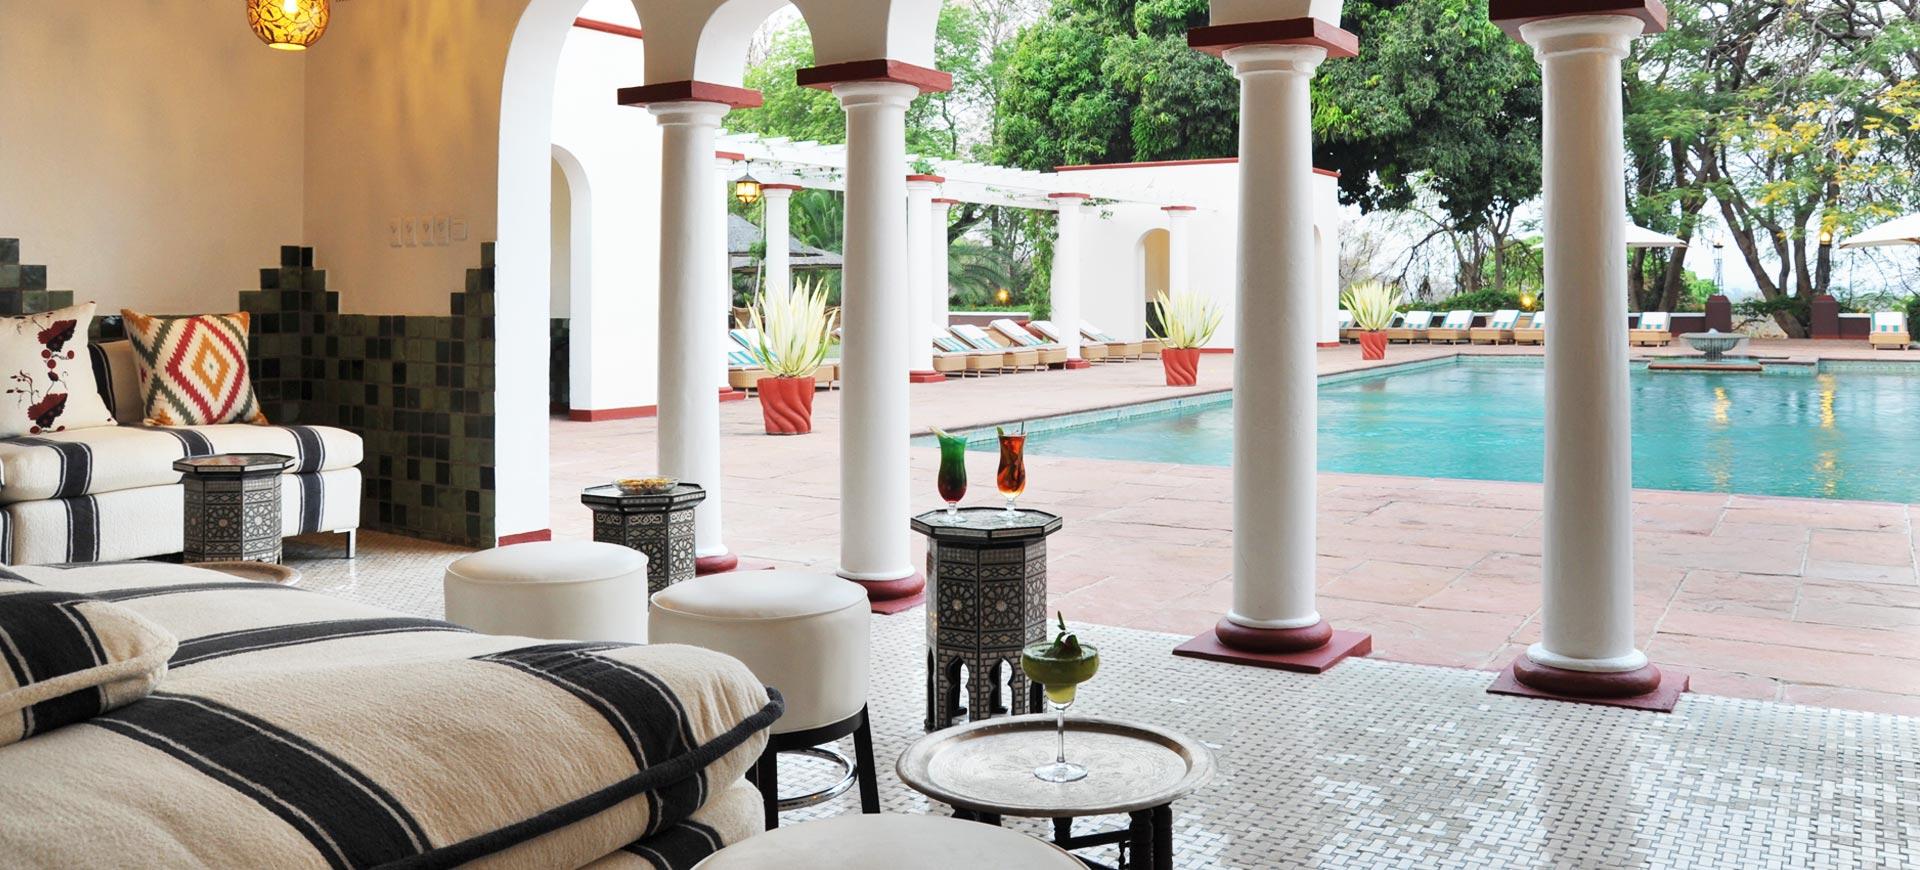 Victoria Falls Hotel Conference Pool